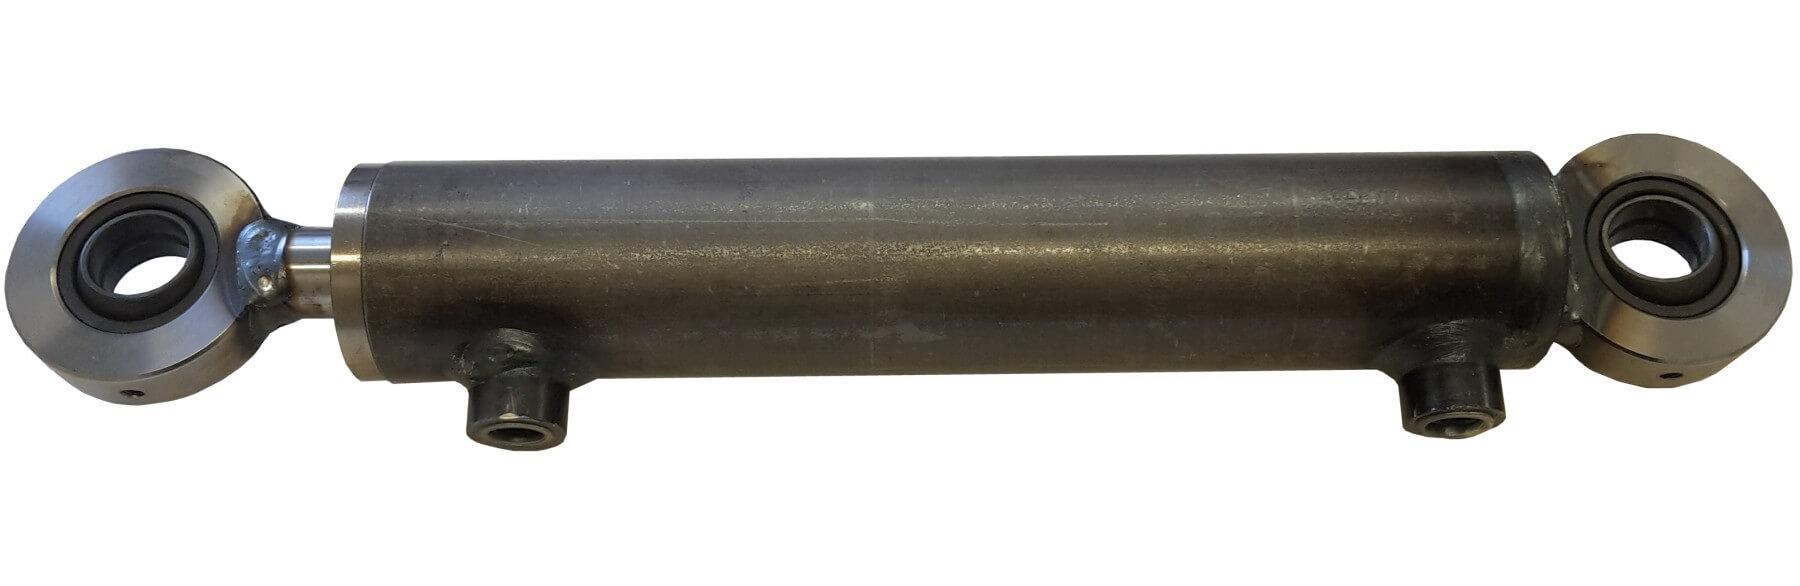 Hydraulisylinteri CL 32. 20. 500 GE